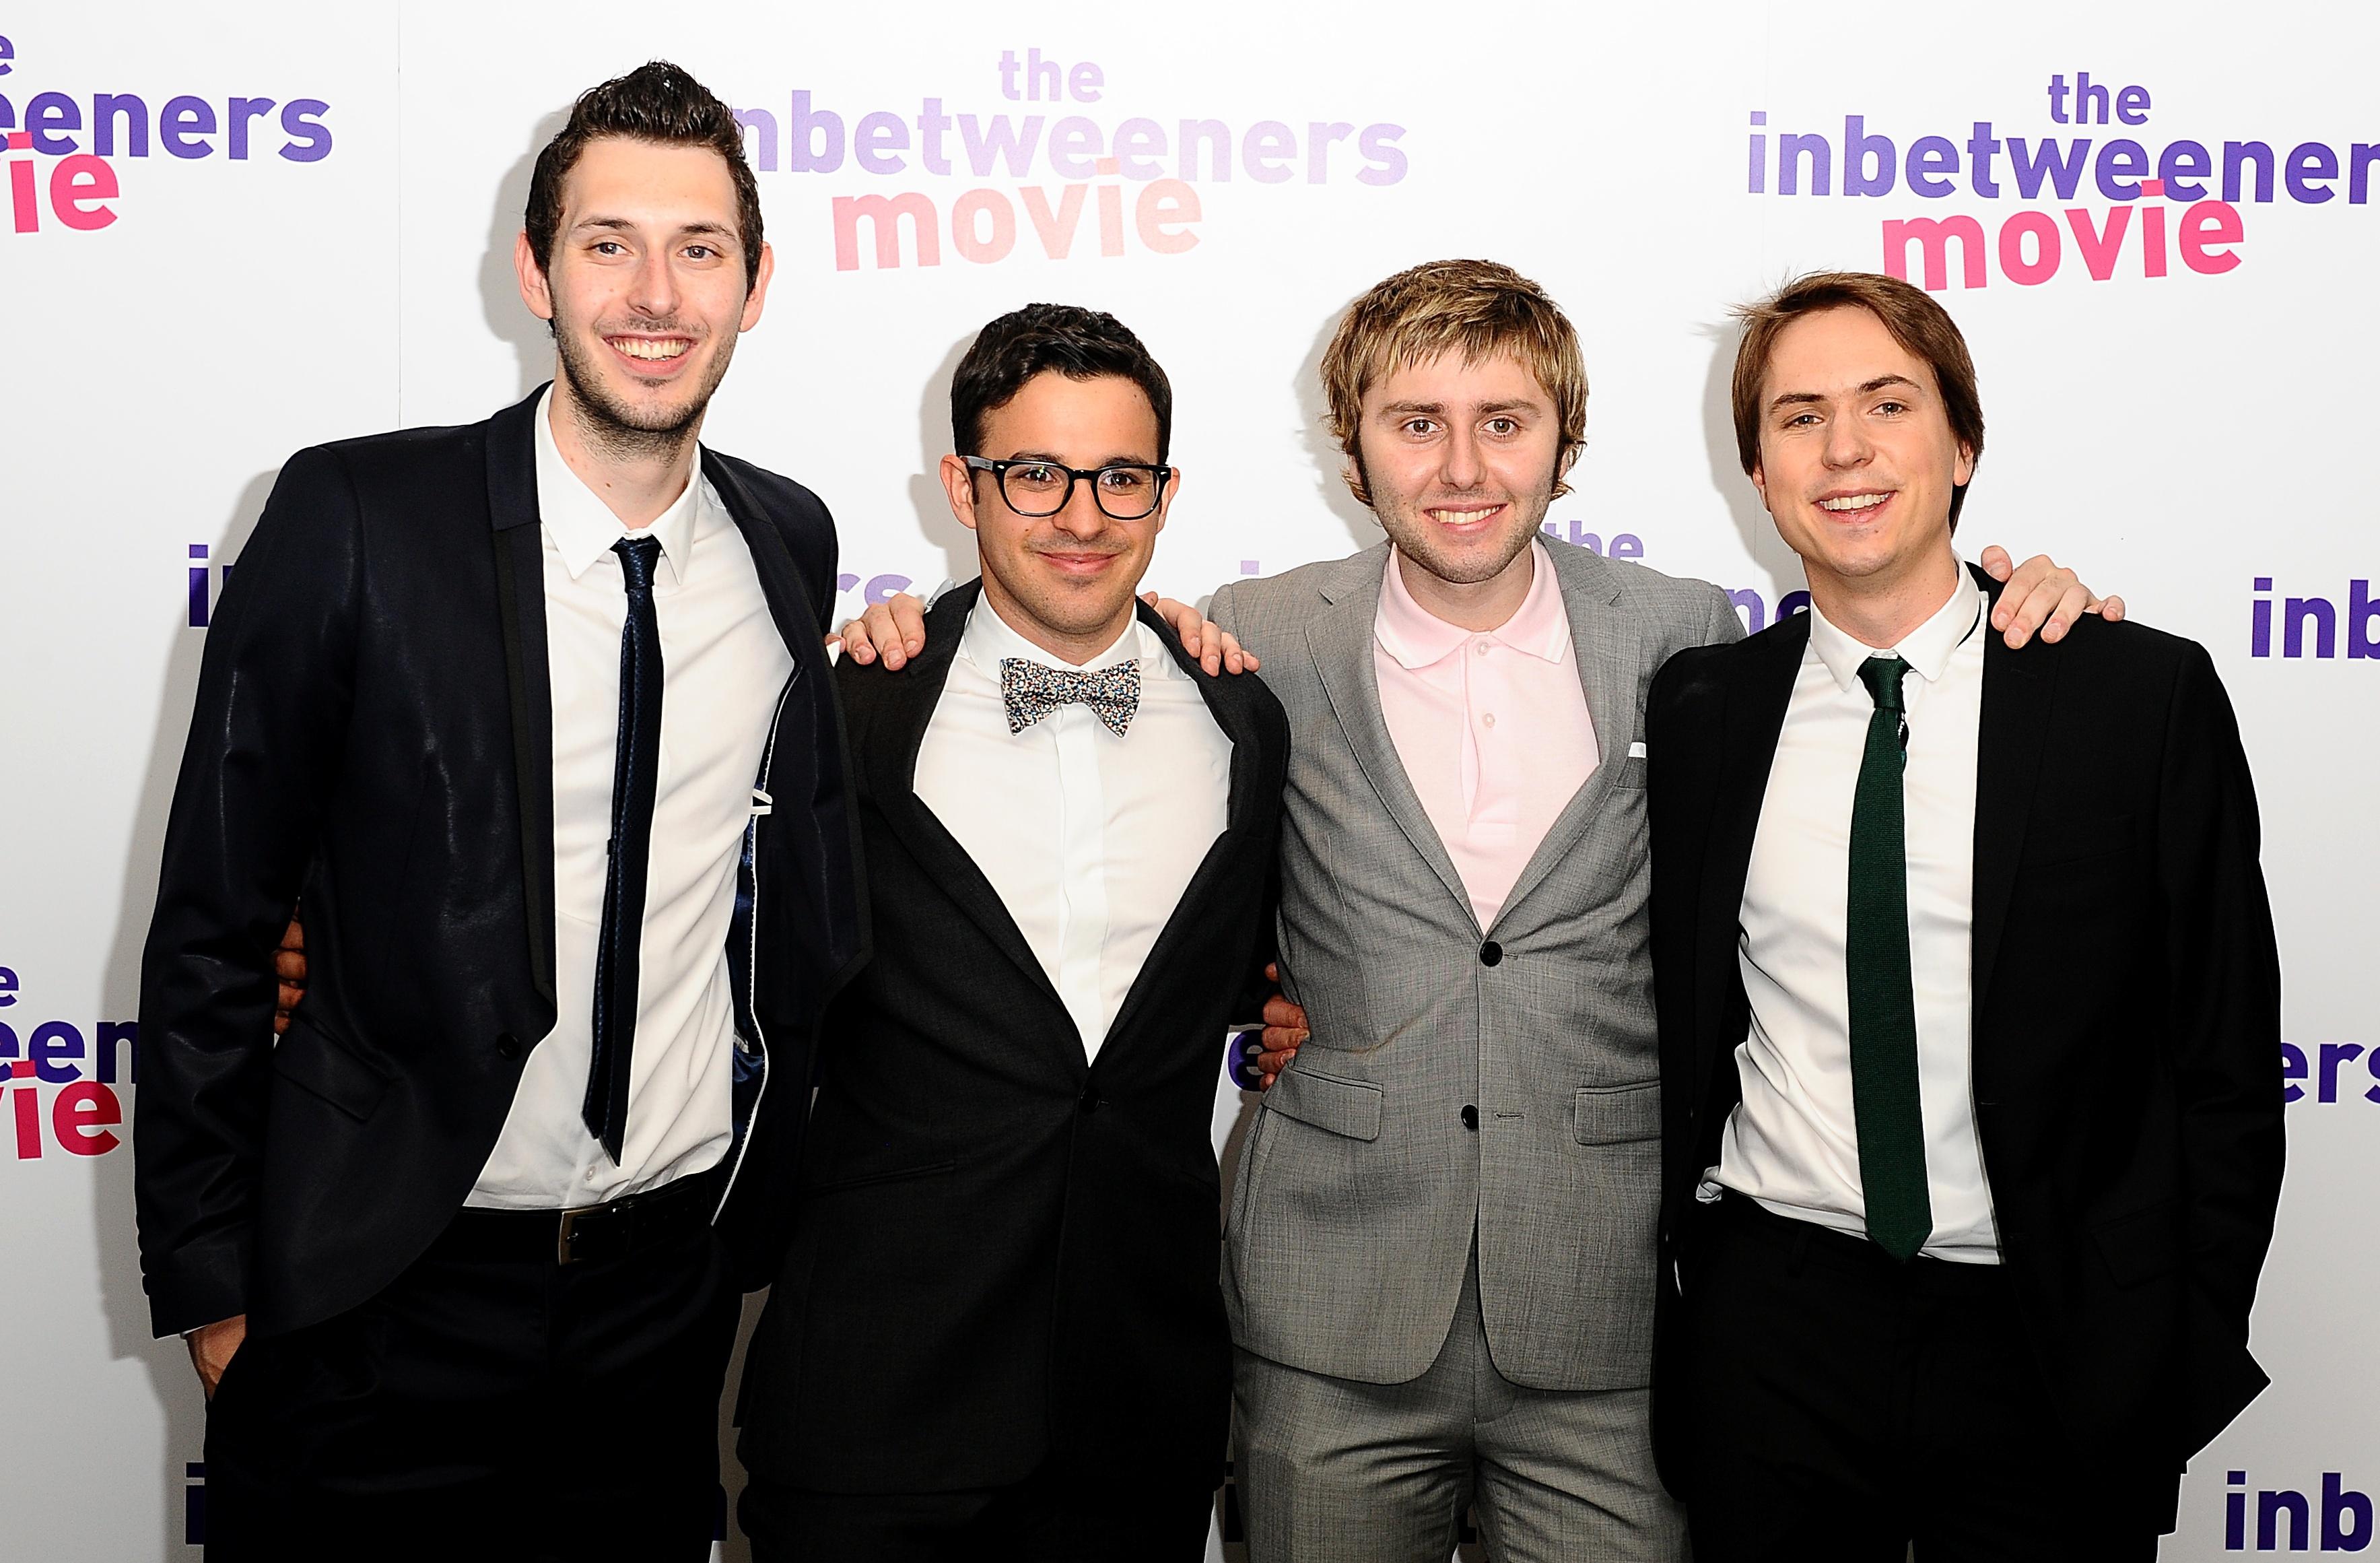 The cast of The Inbetweeners (l-r) Blake Harrison, Simon Bird, James Buckley and Joe Thomas  (Ian West/PA Wire)